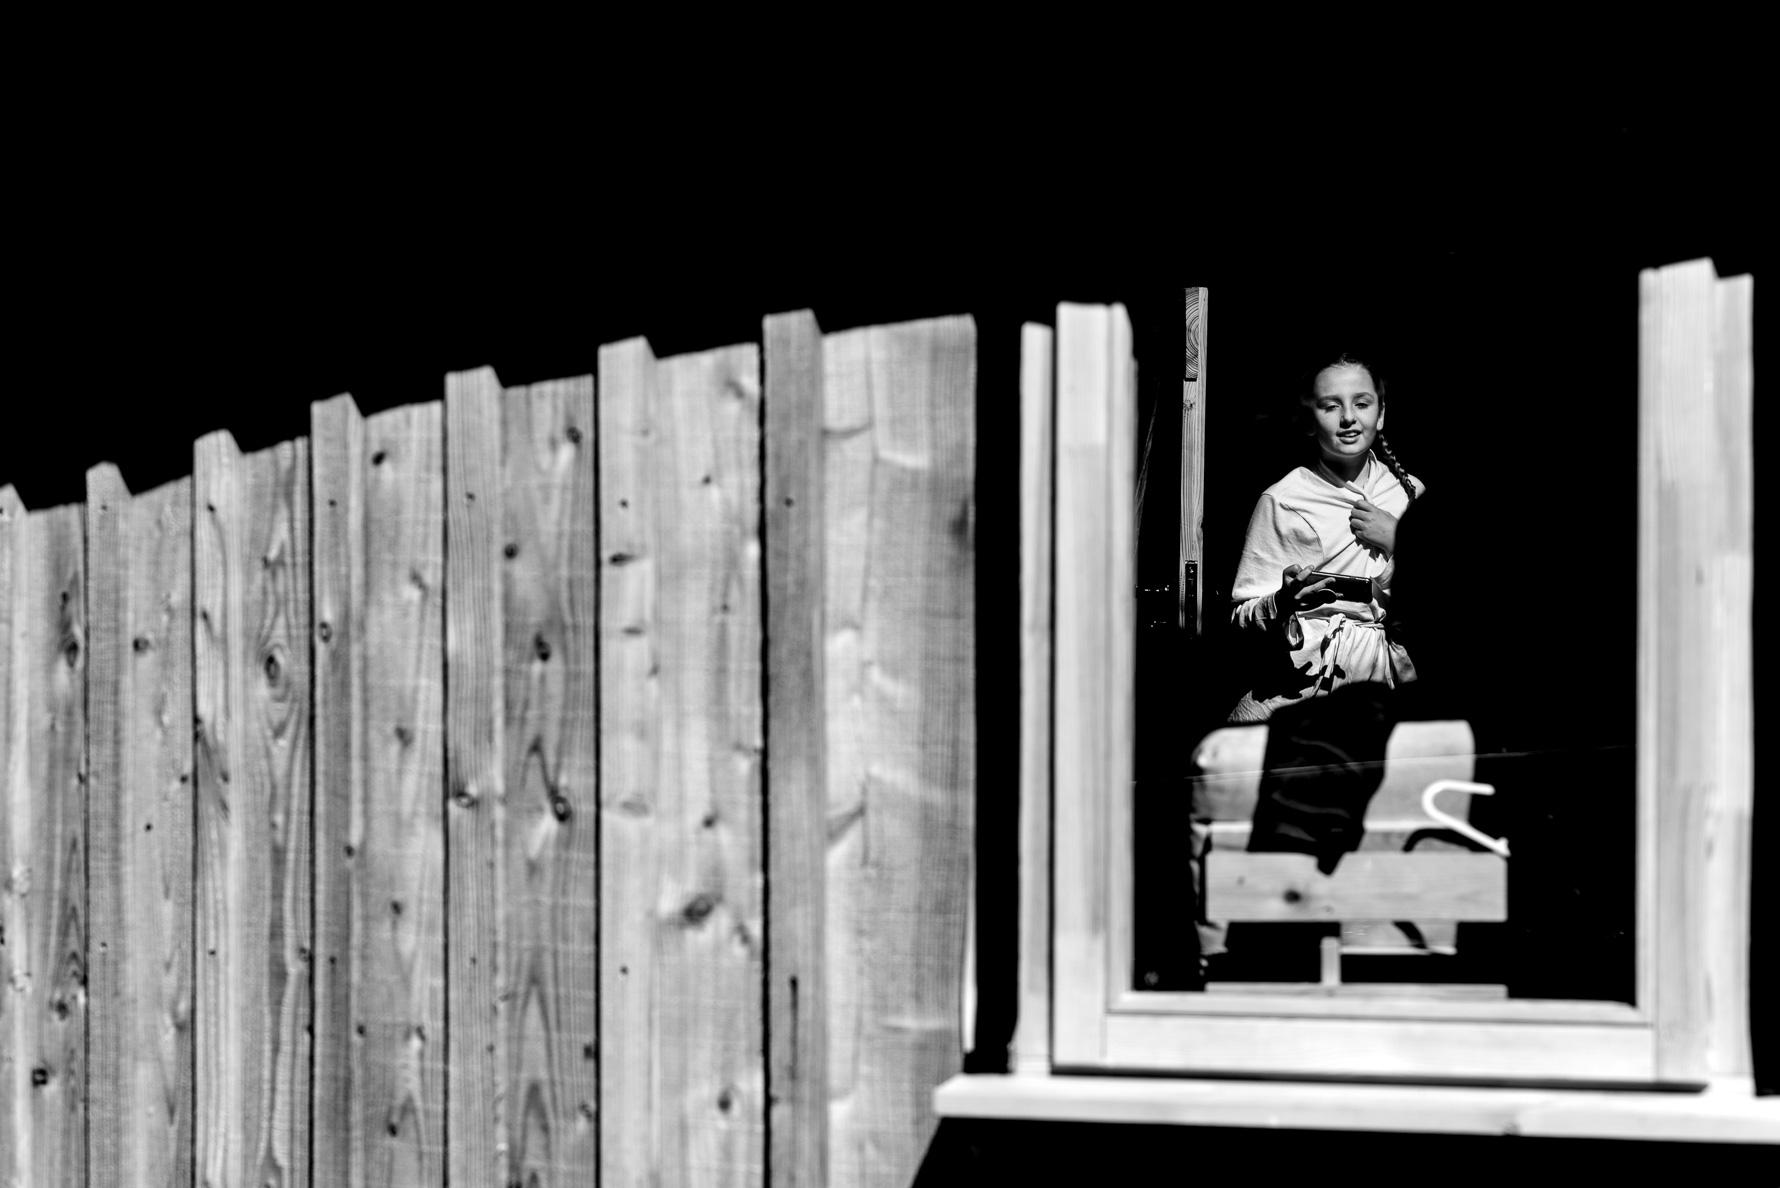 Daughter through yurt window